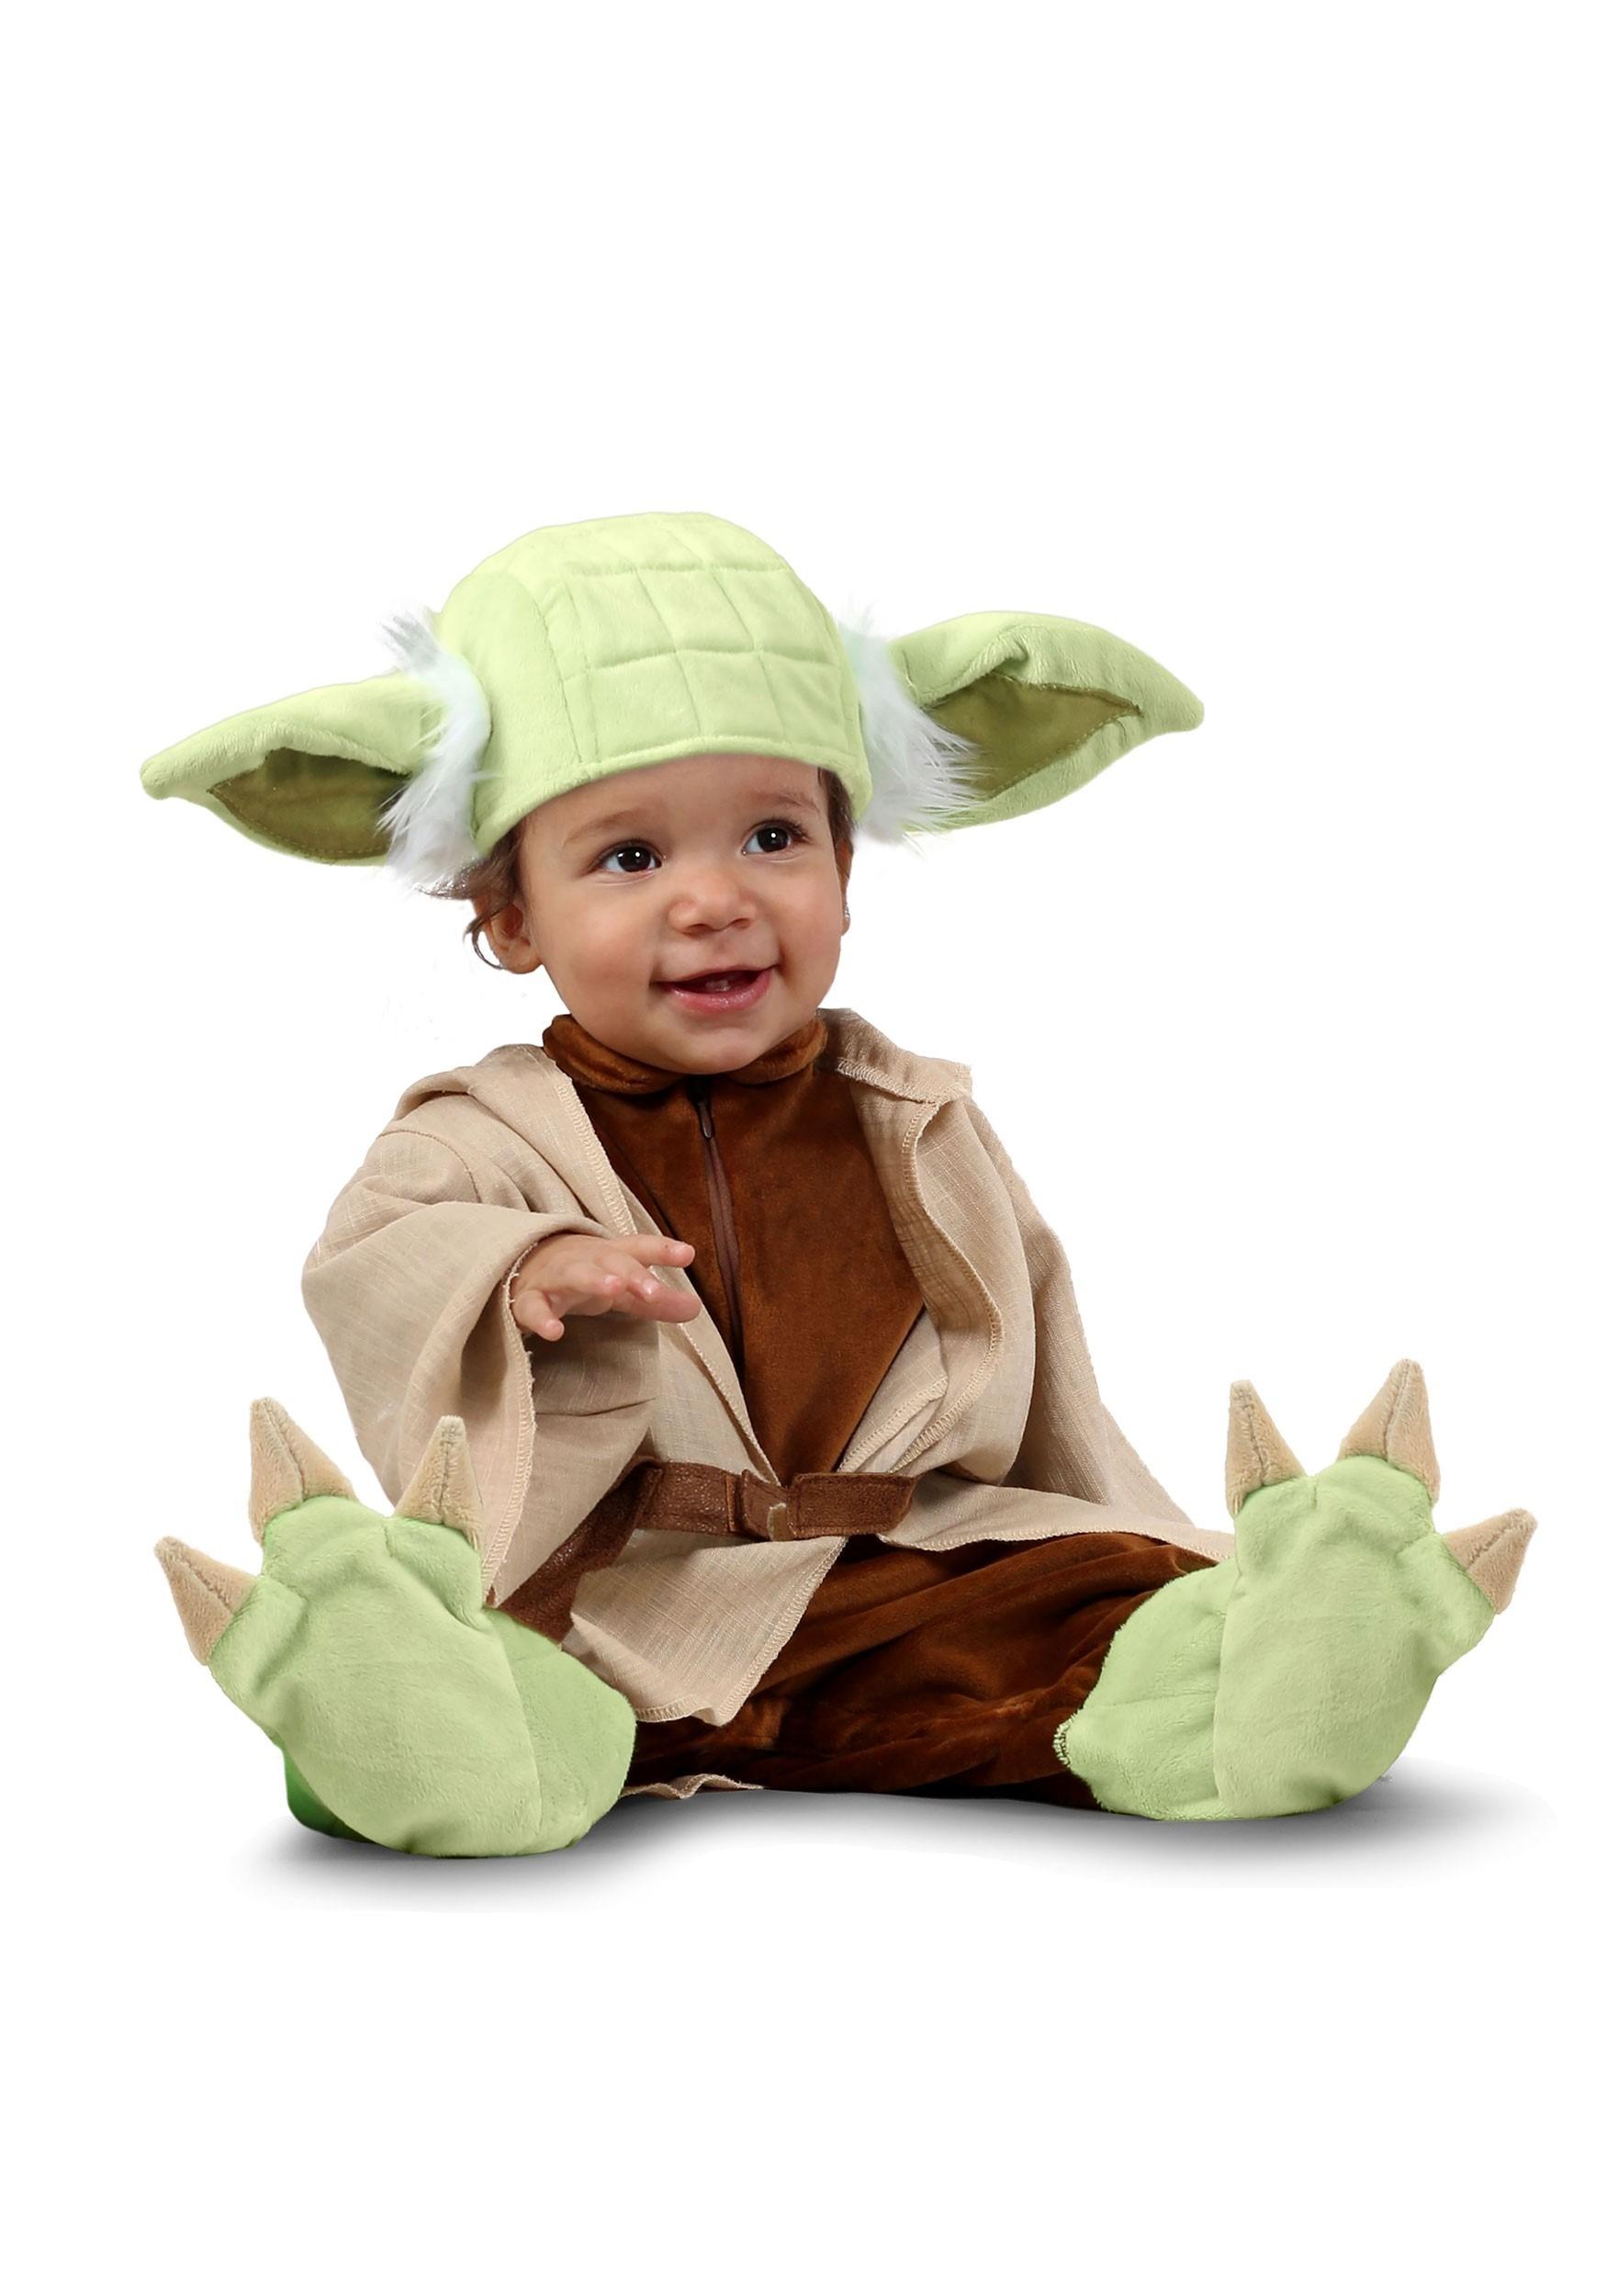 Star Wars Yoda Costume for Babies